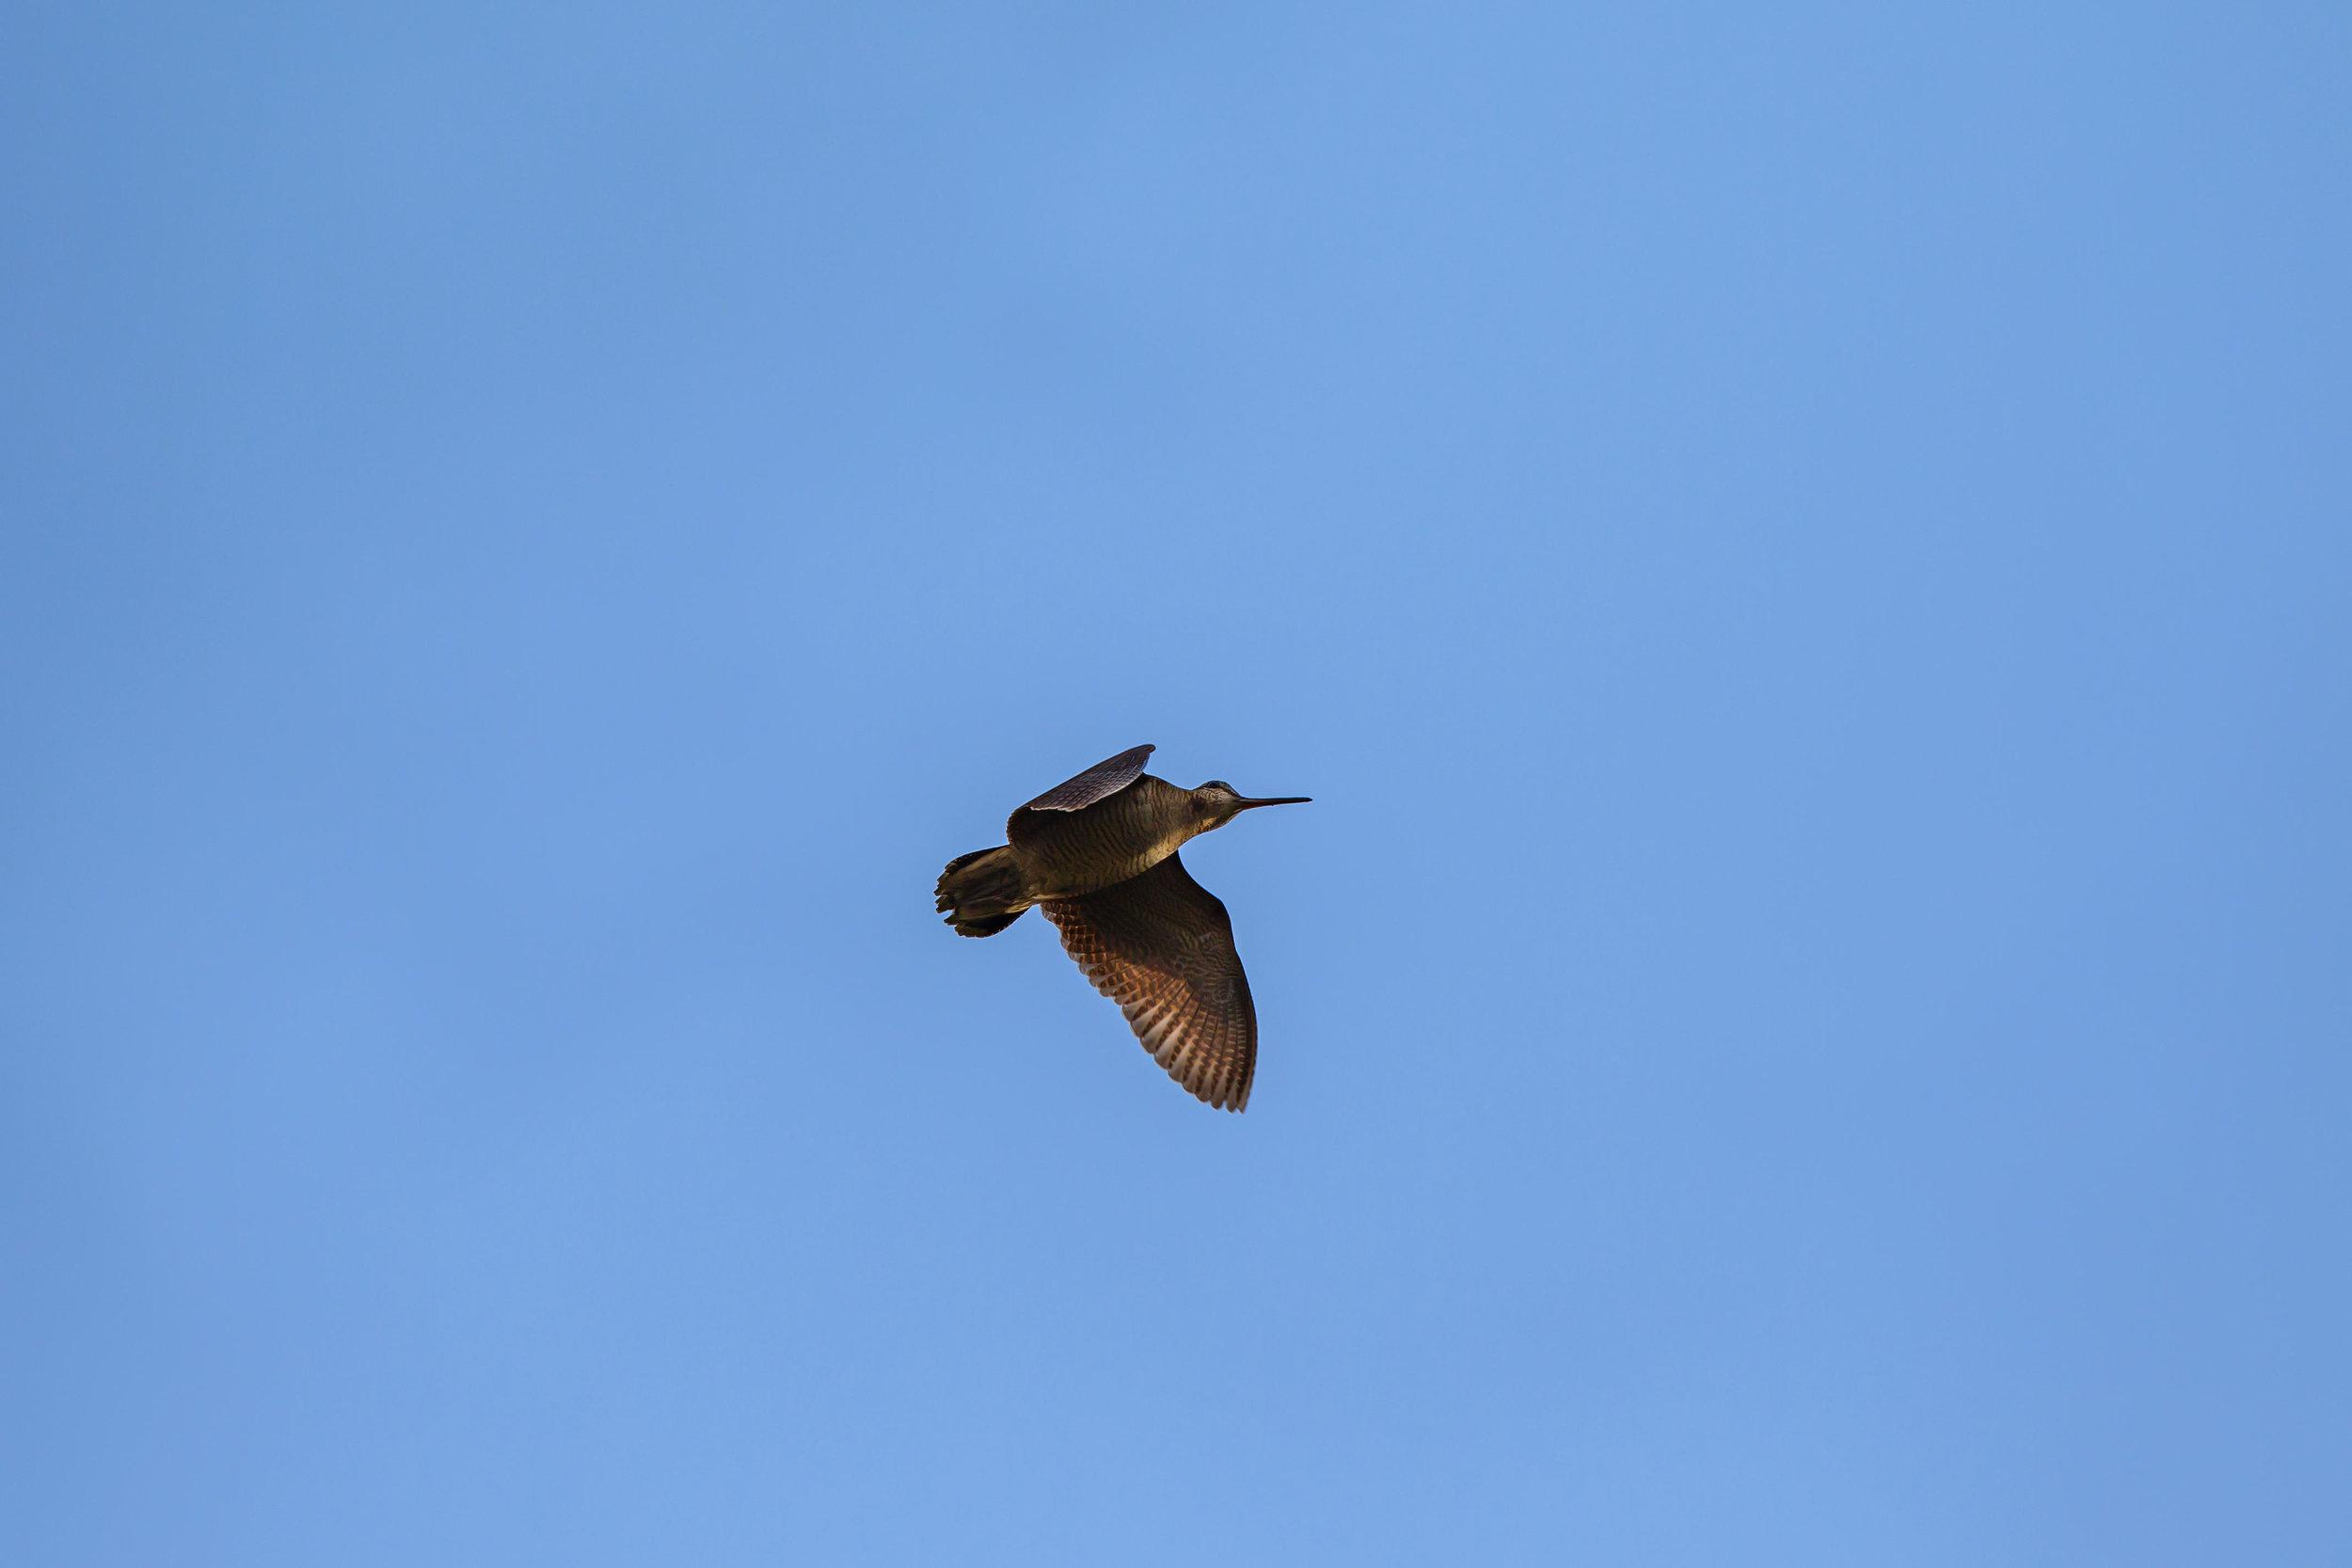 Woodock in roding display flight